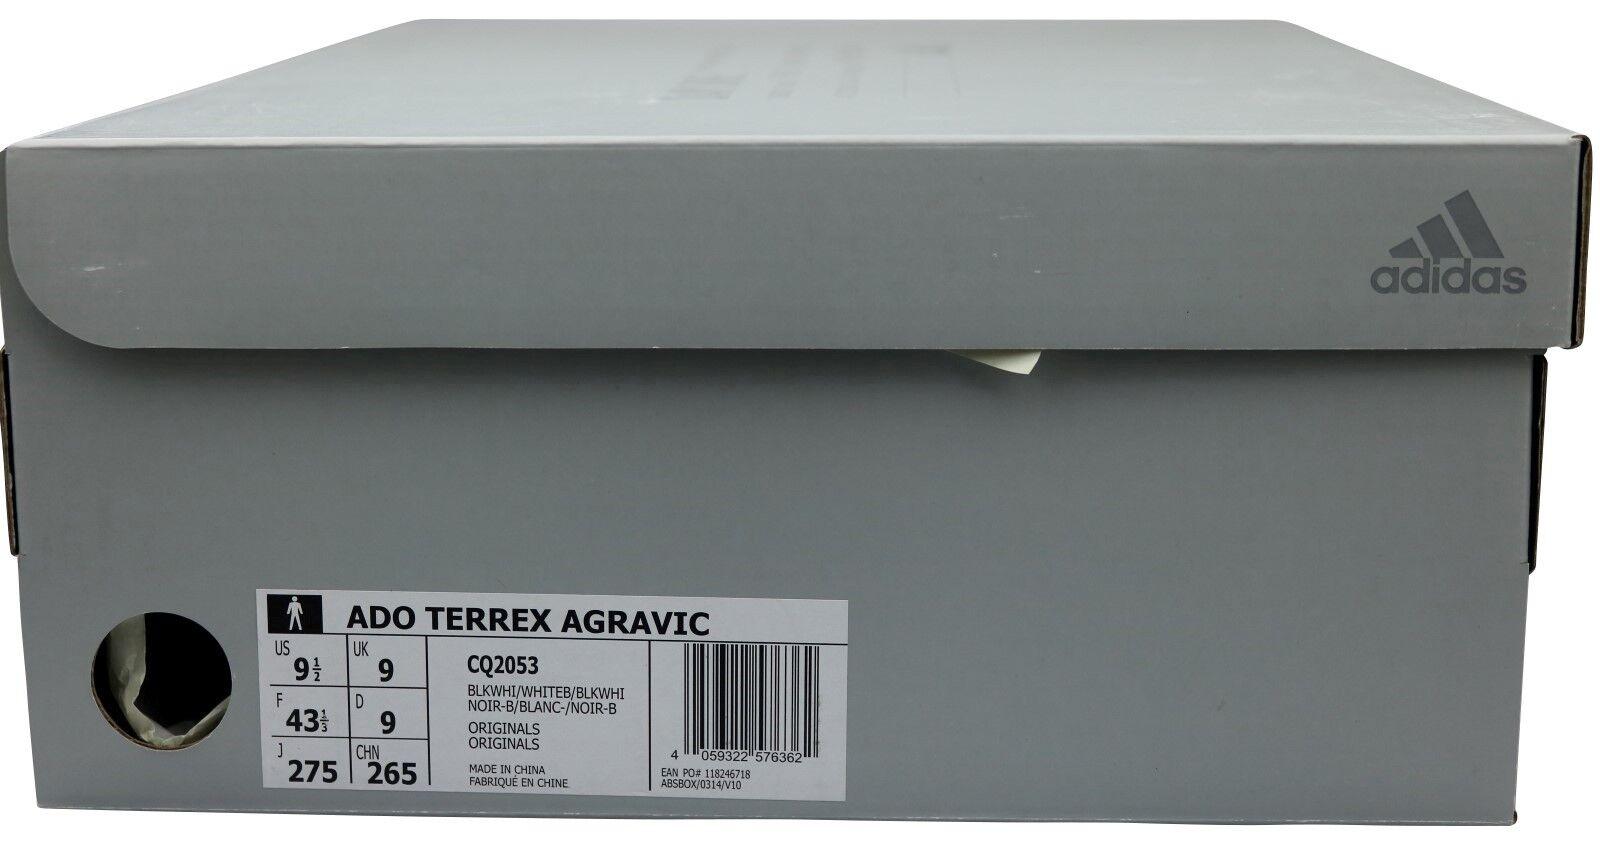 Adidas ADO Day One Terrex Agravic Herren Schuhe schwarz